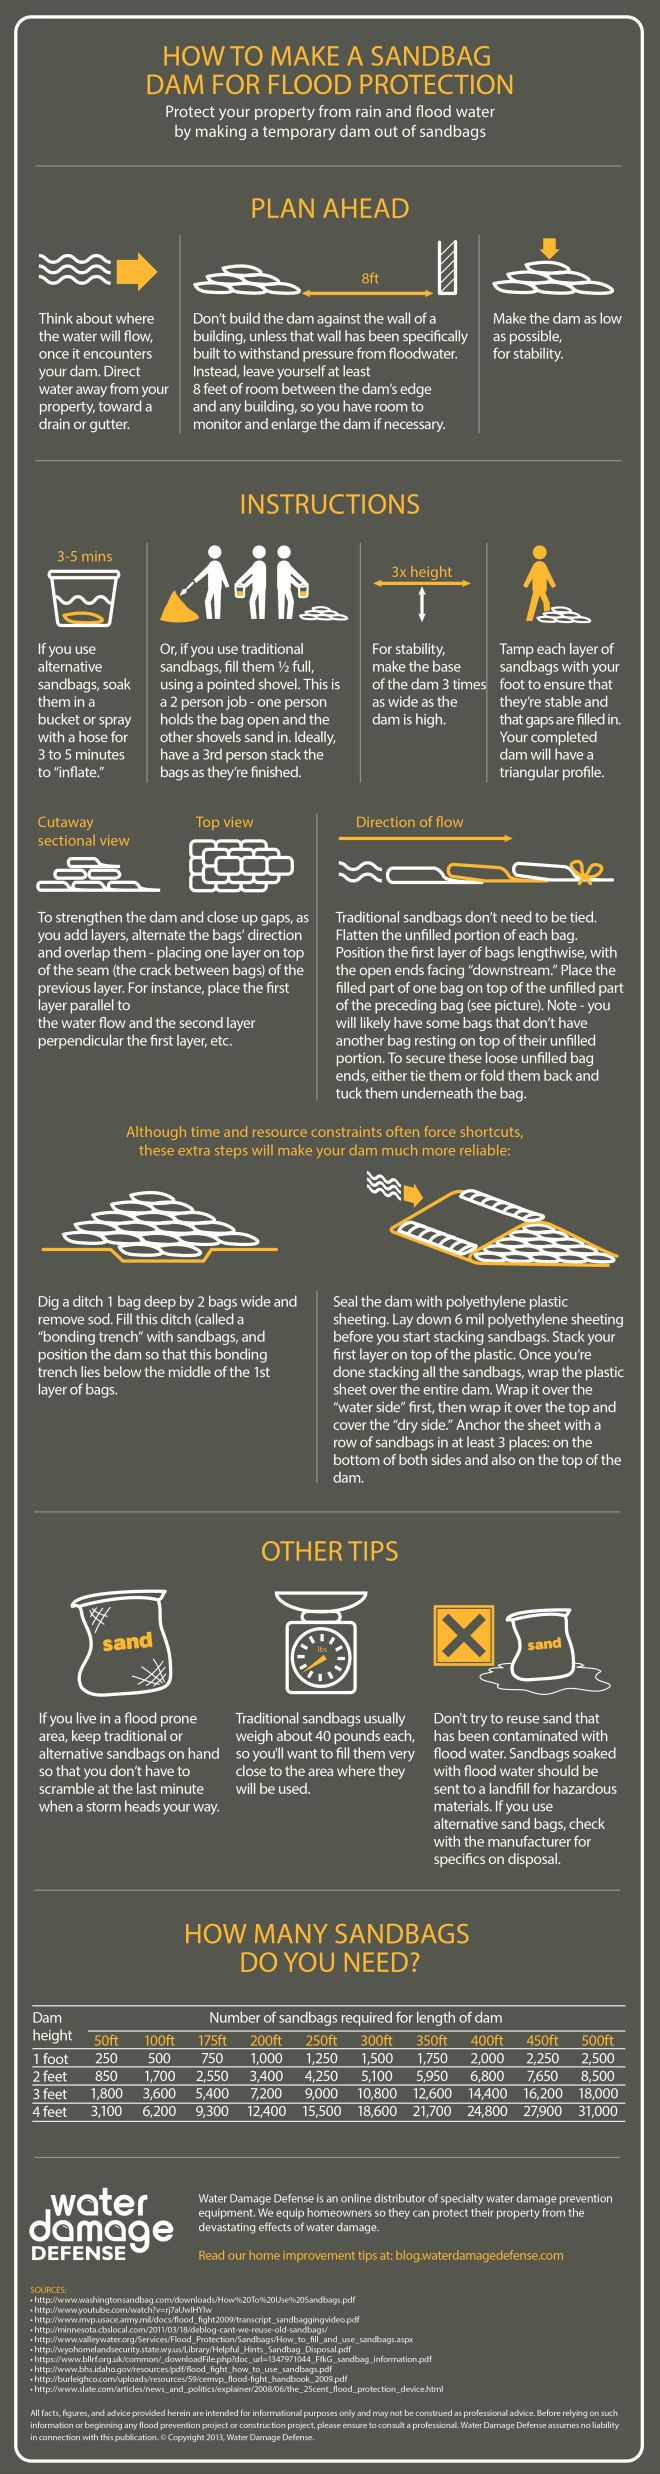 How to Make a Sandbag Dam For Flood Protection  #HowTo #Flood #Emergency  #infographic